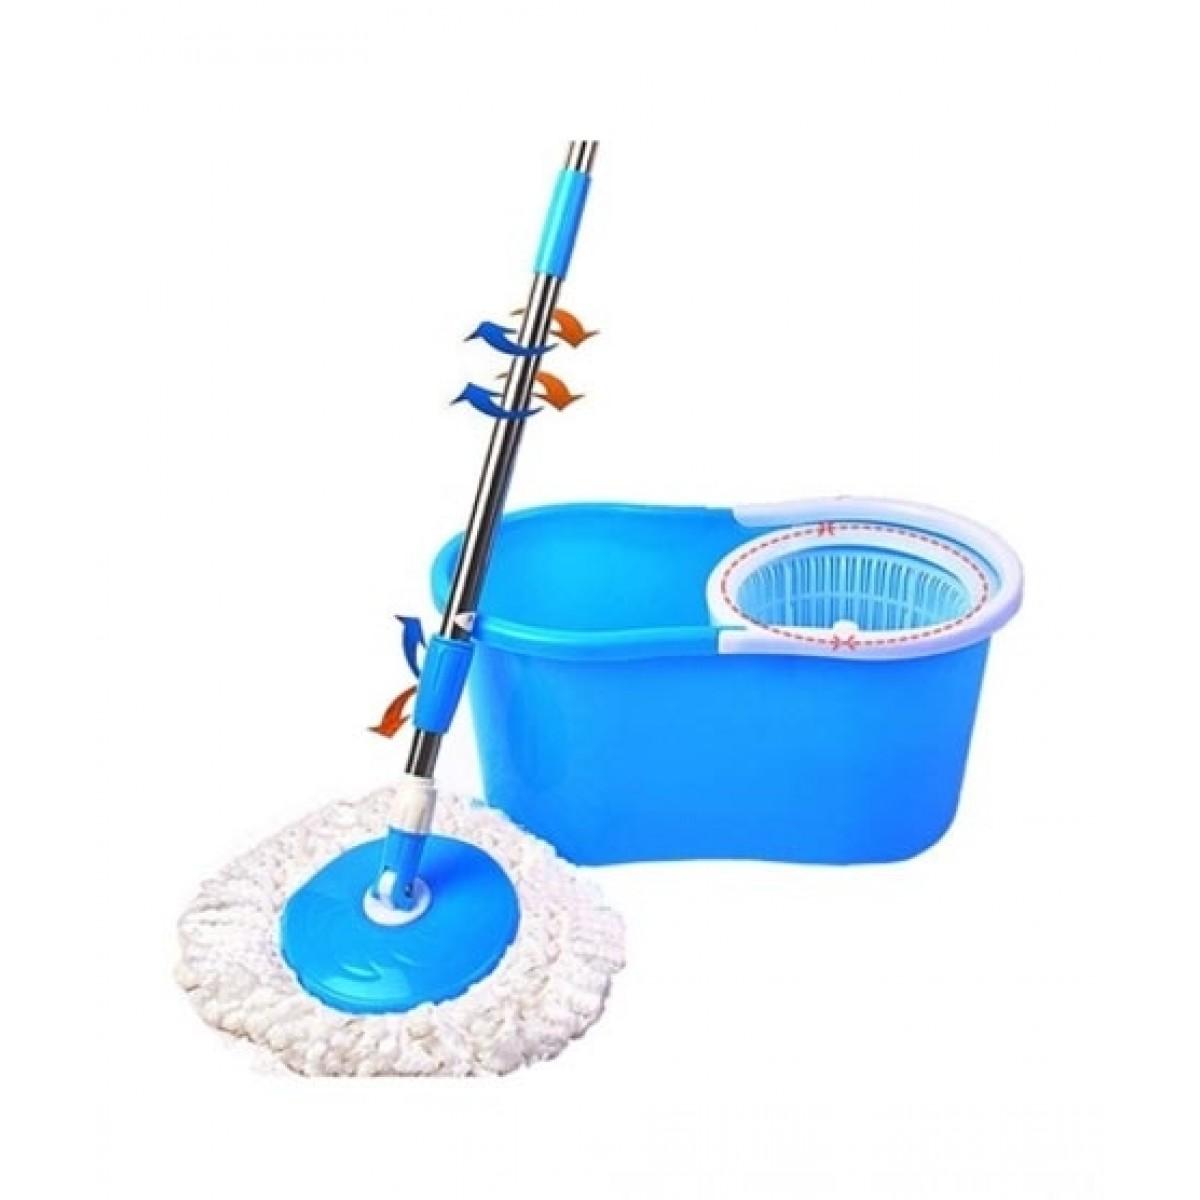 Hatimi Store 360 Degree Microfiber Spin Mop